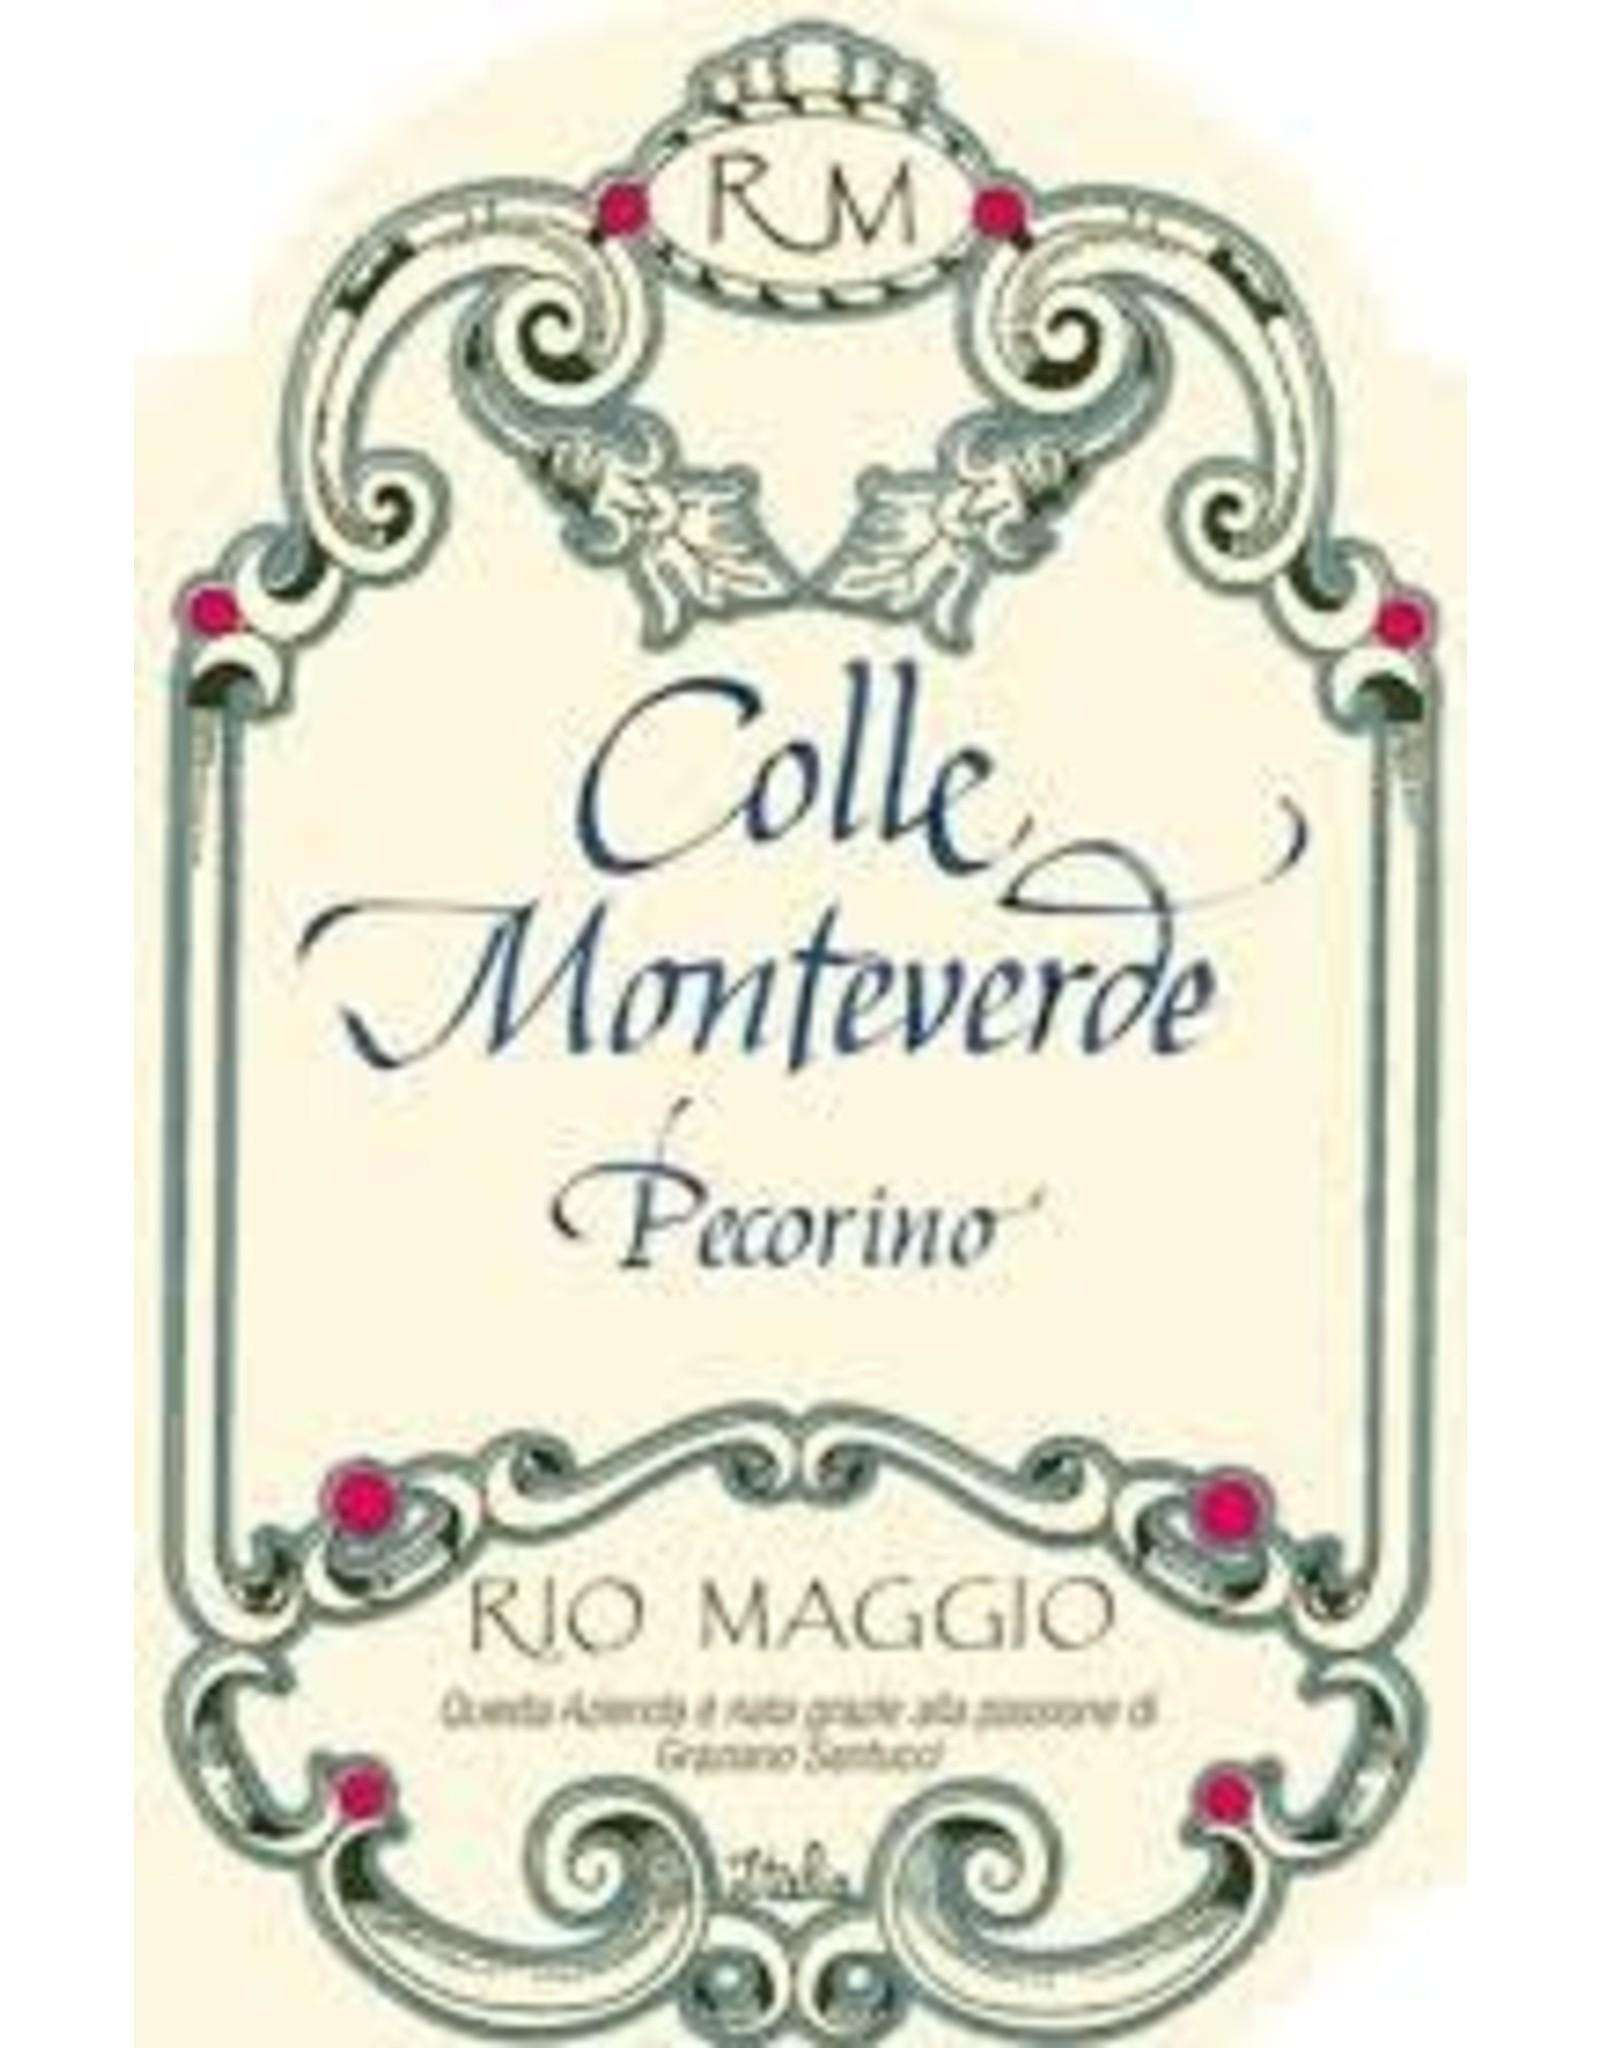 Italy Rio Maggio Colle Menteverde Pecorino